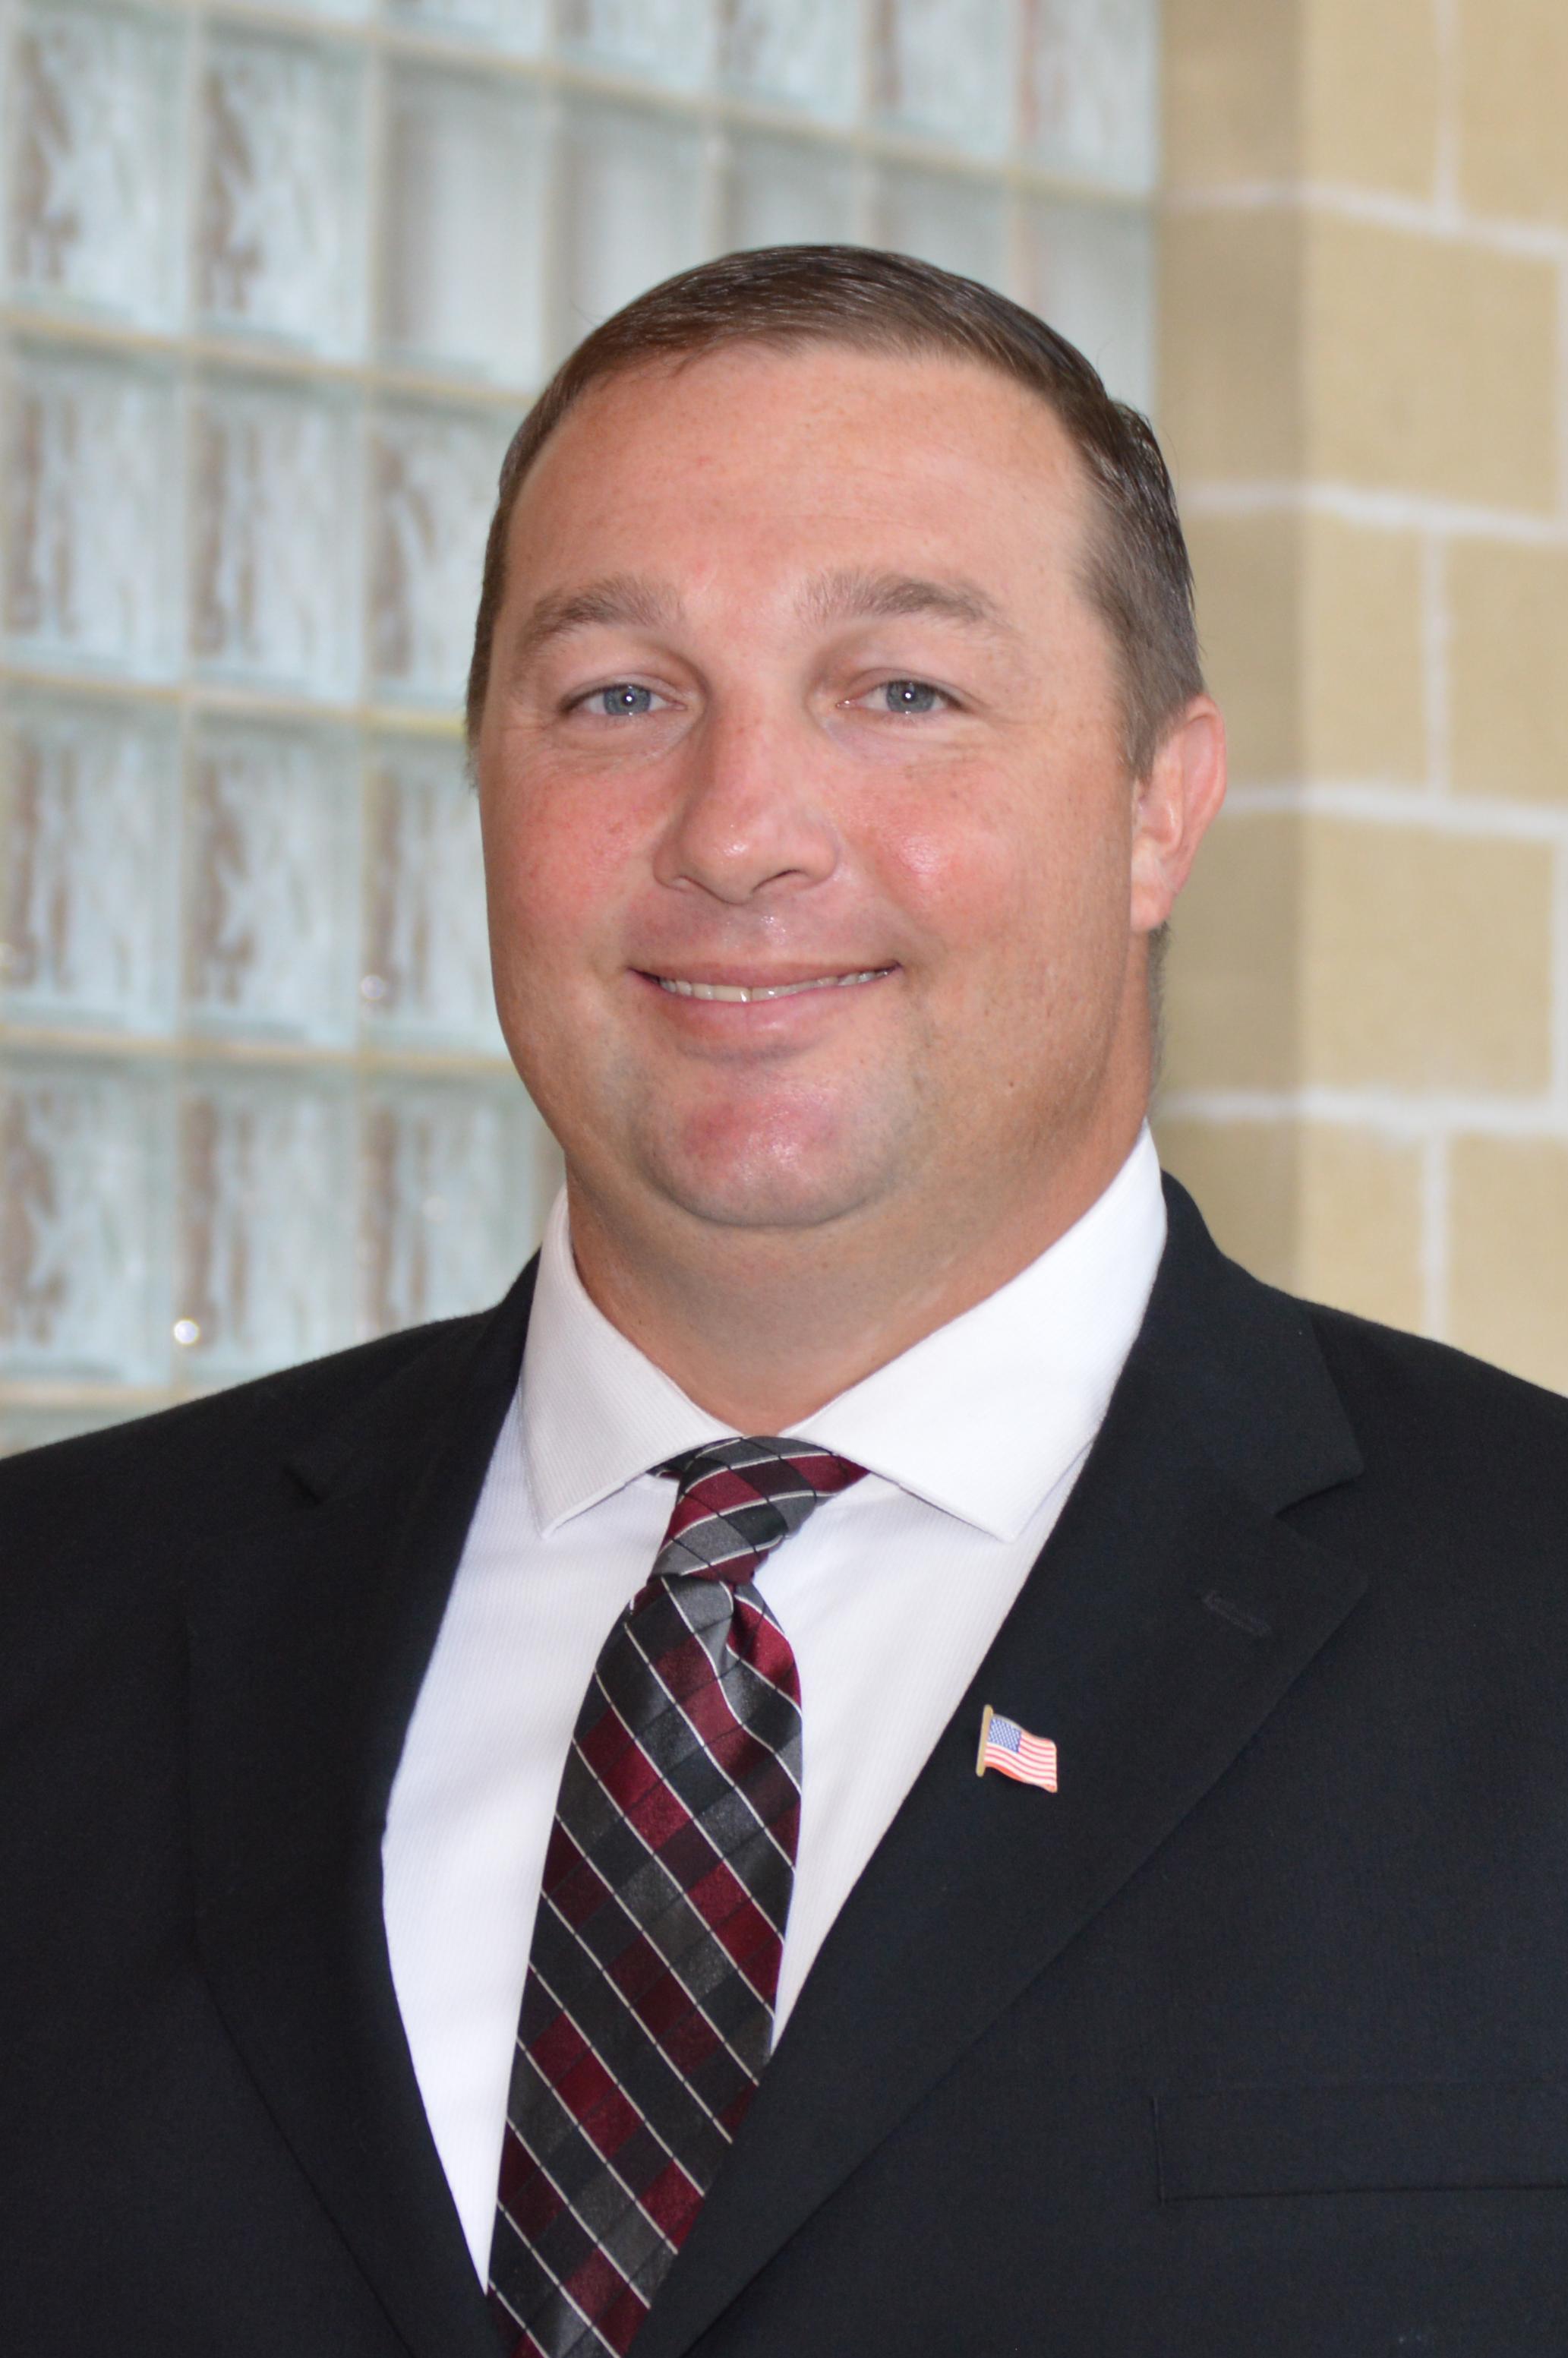 Principal Davisson